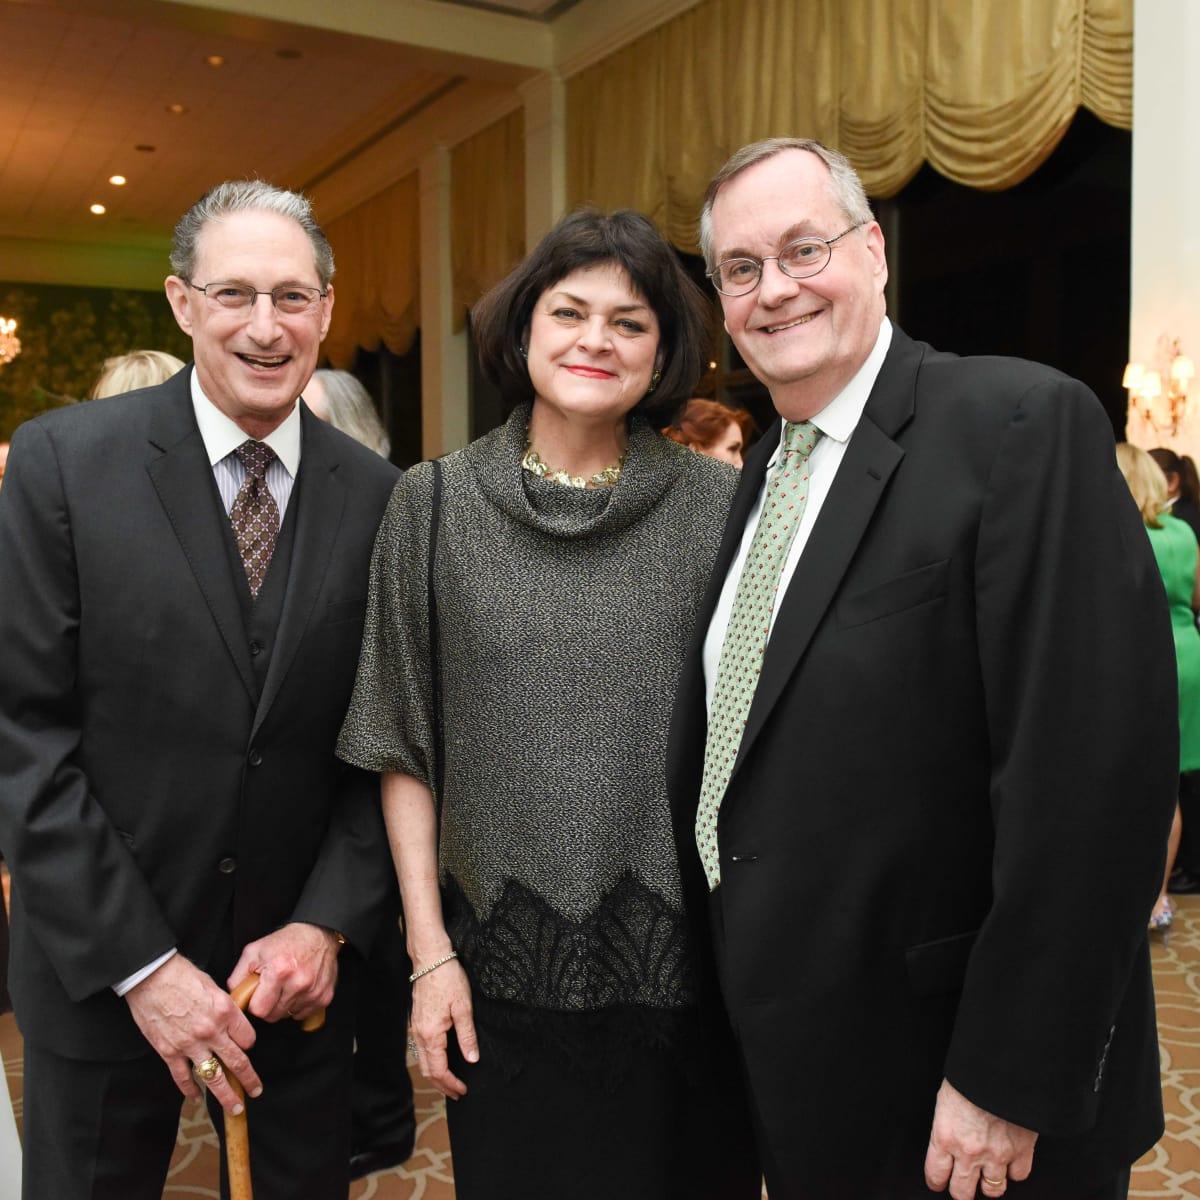 Cornerstone Dinner, Feb. 2016, Jeff Bricker, Cindy Burns, Larry Burns